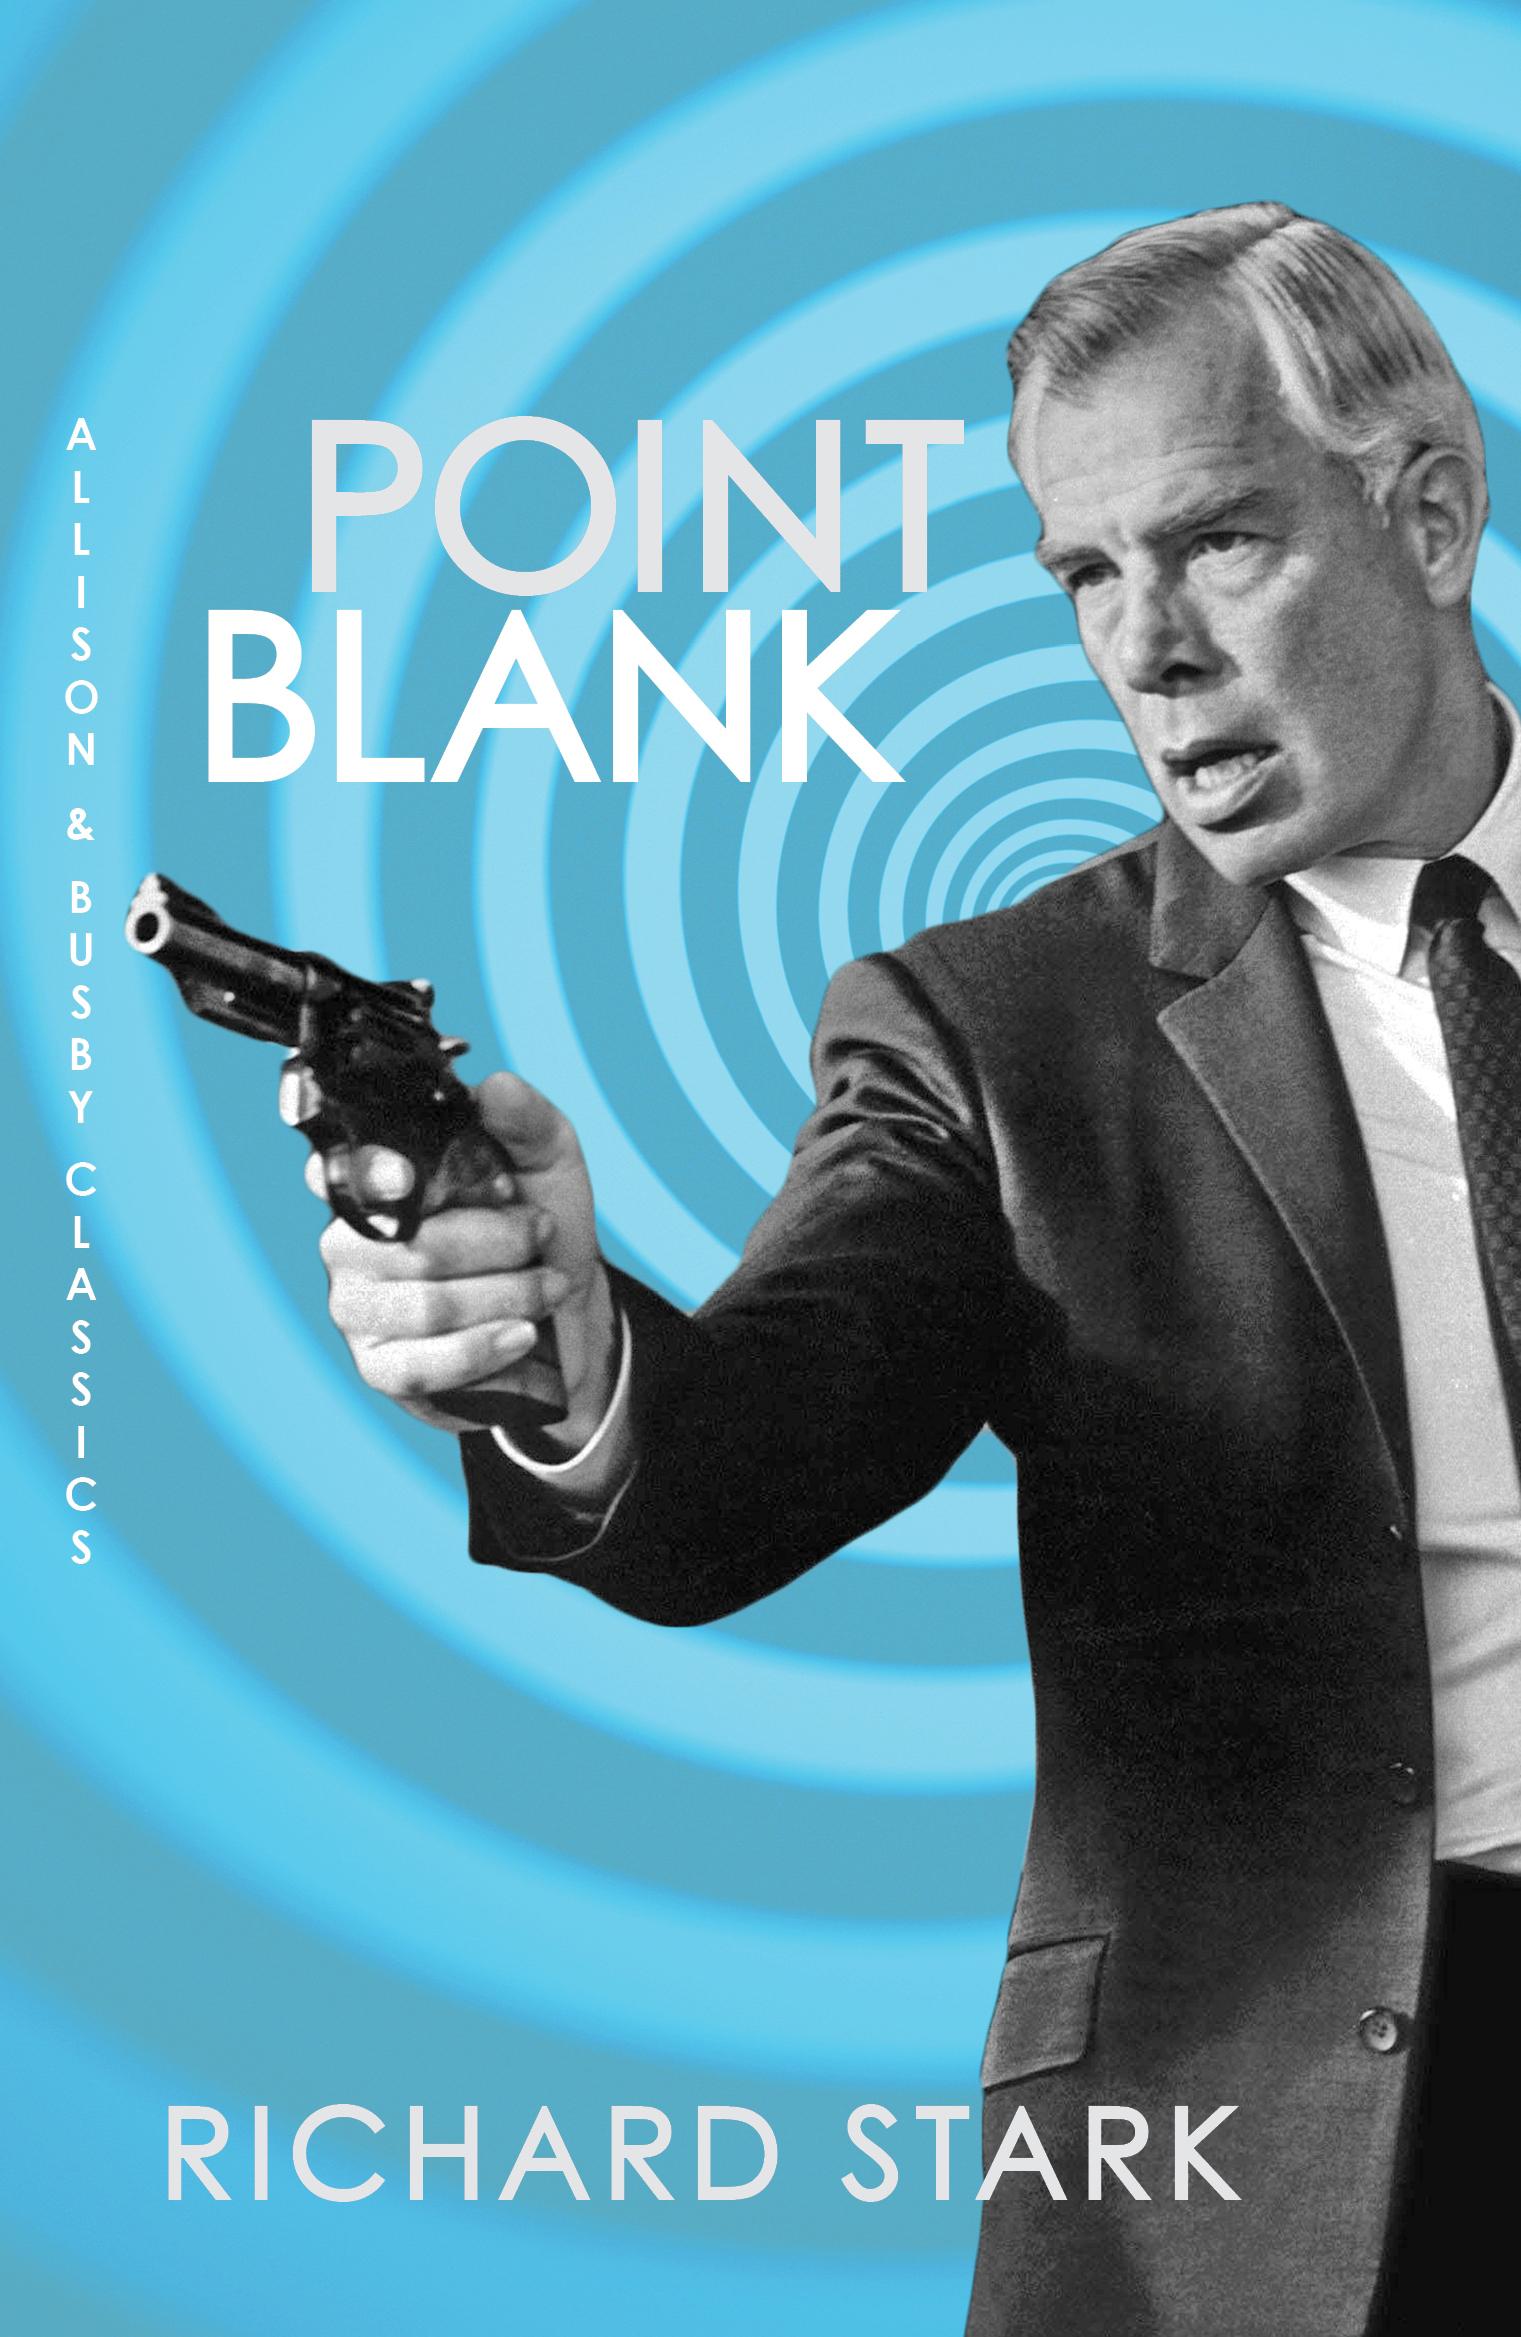 Point Blank - Richard Stark - 9780749021931 - Allen & Unwin